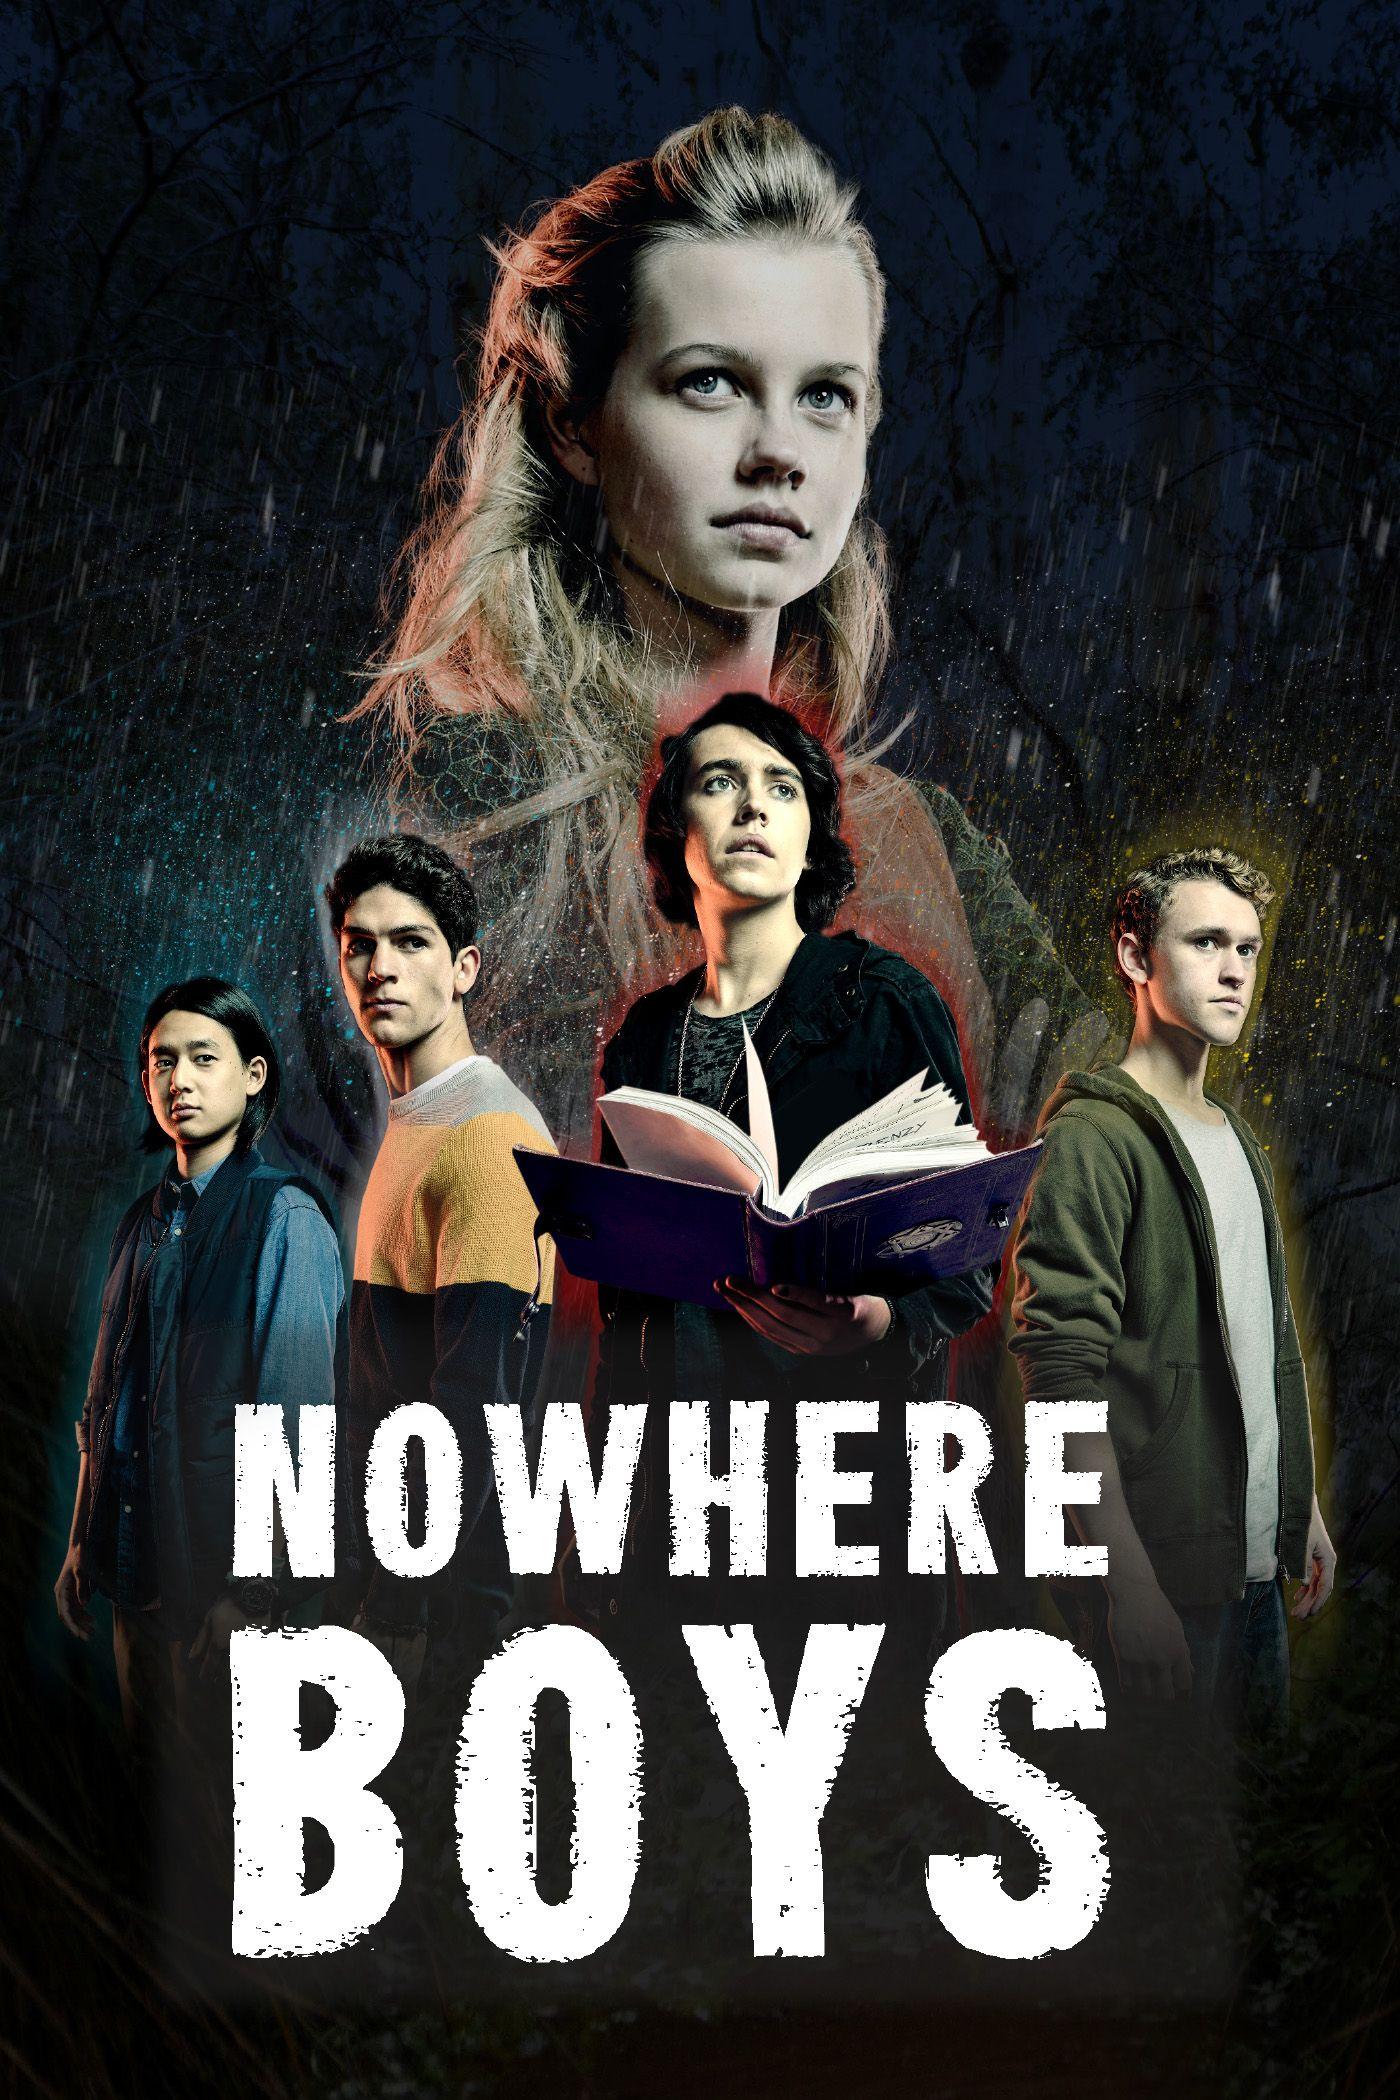 Nowhere boys the book of shadows animali